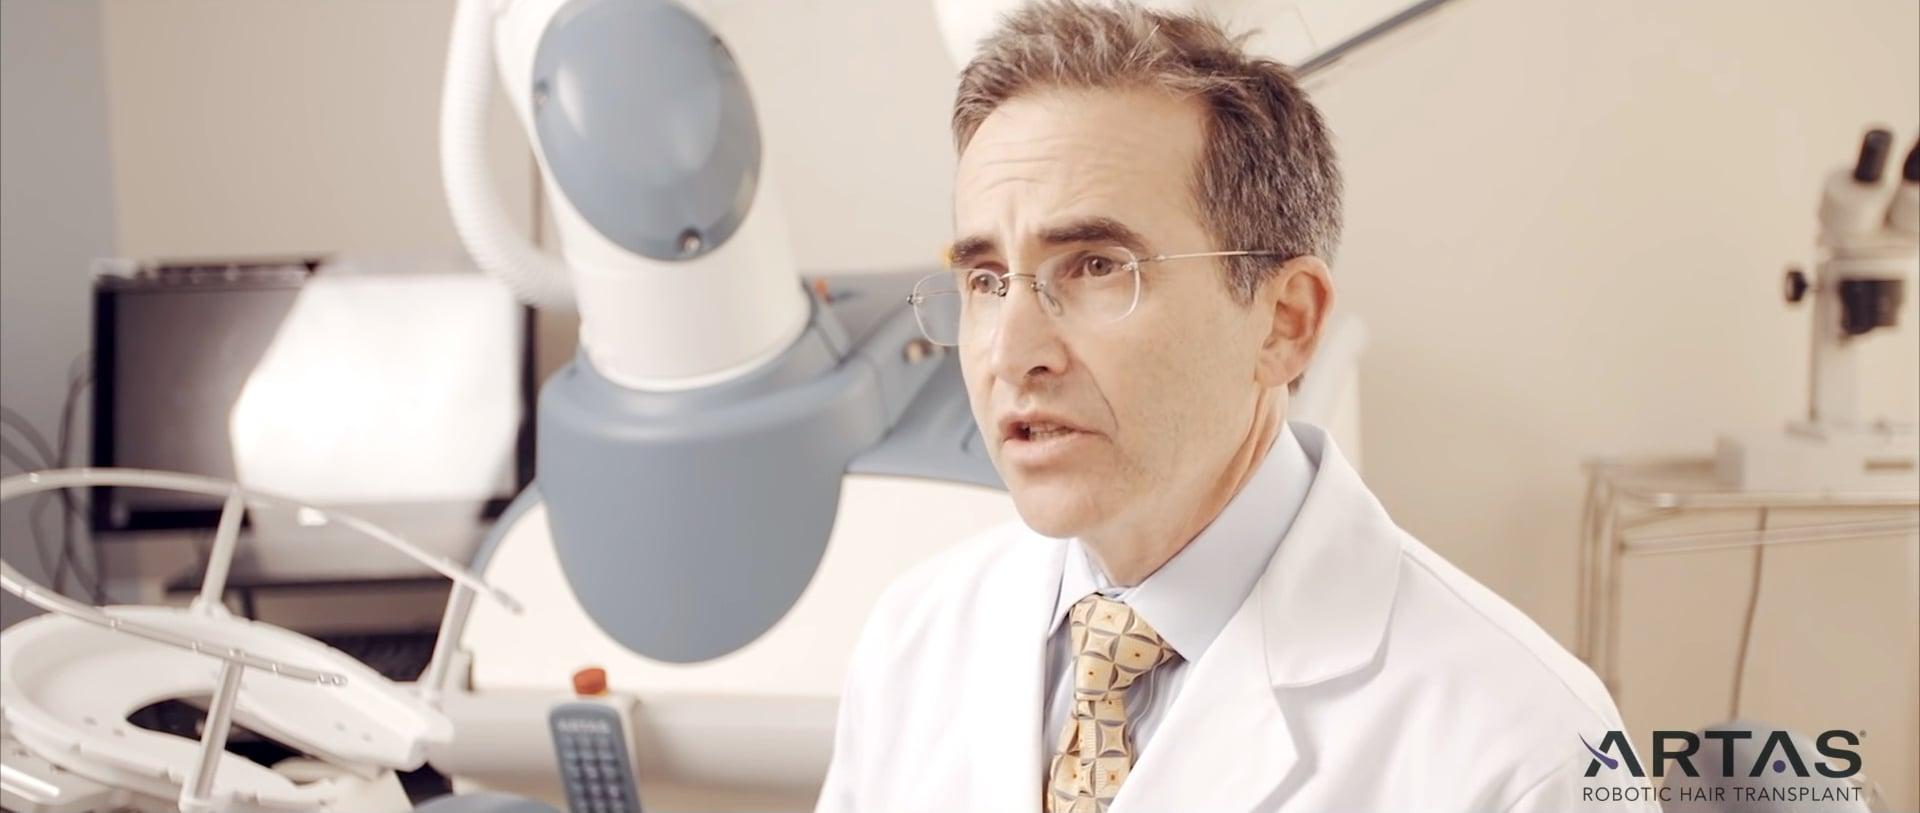 david-artas-robotic-hair-transplant-overview